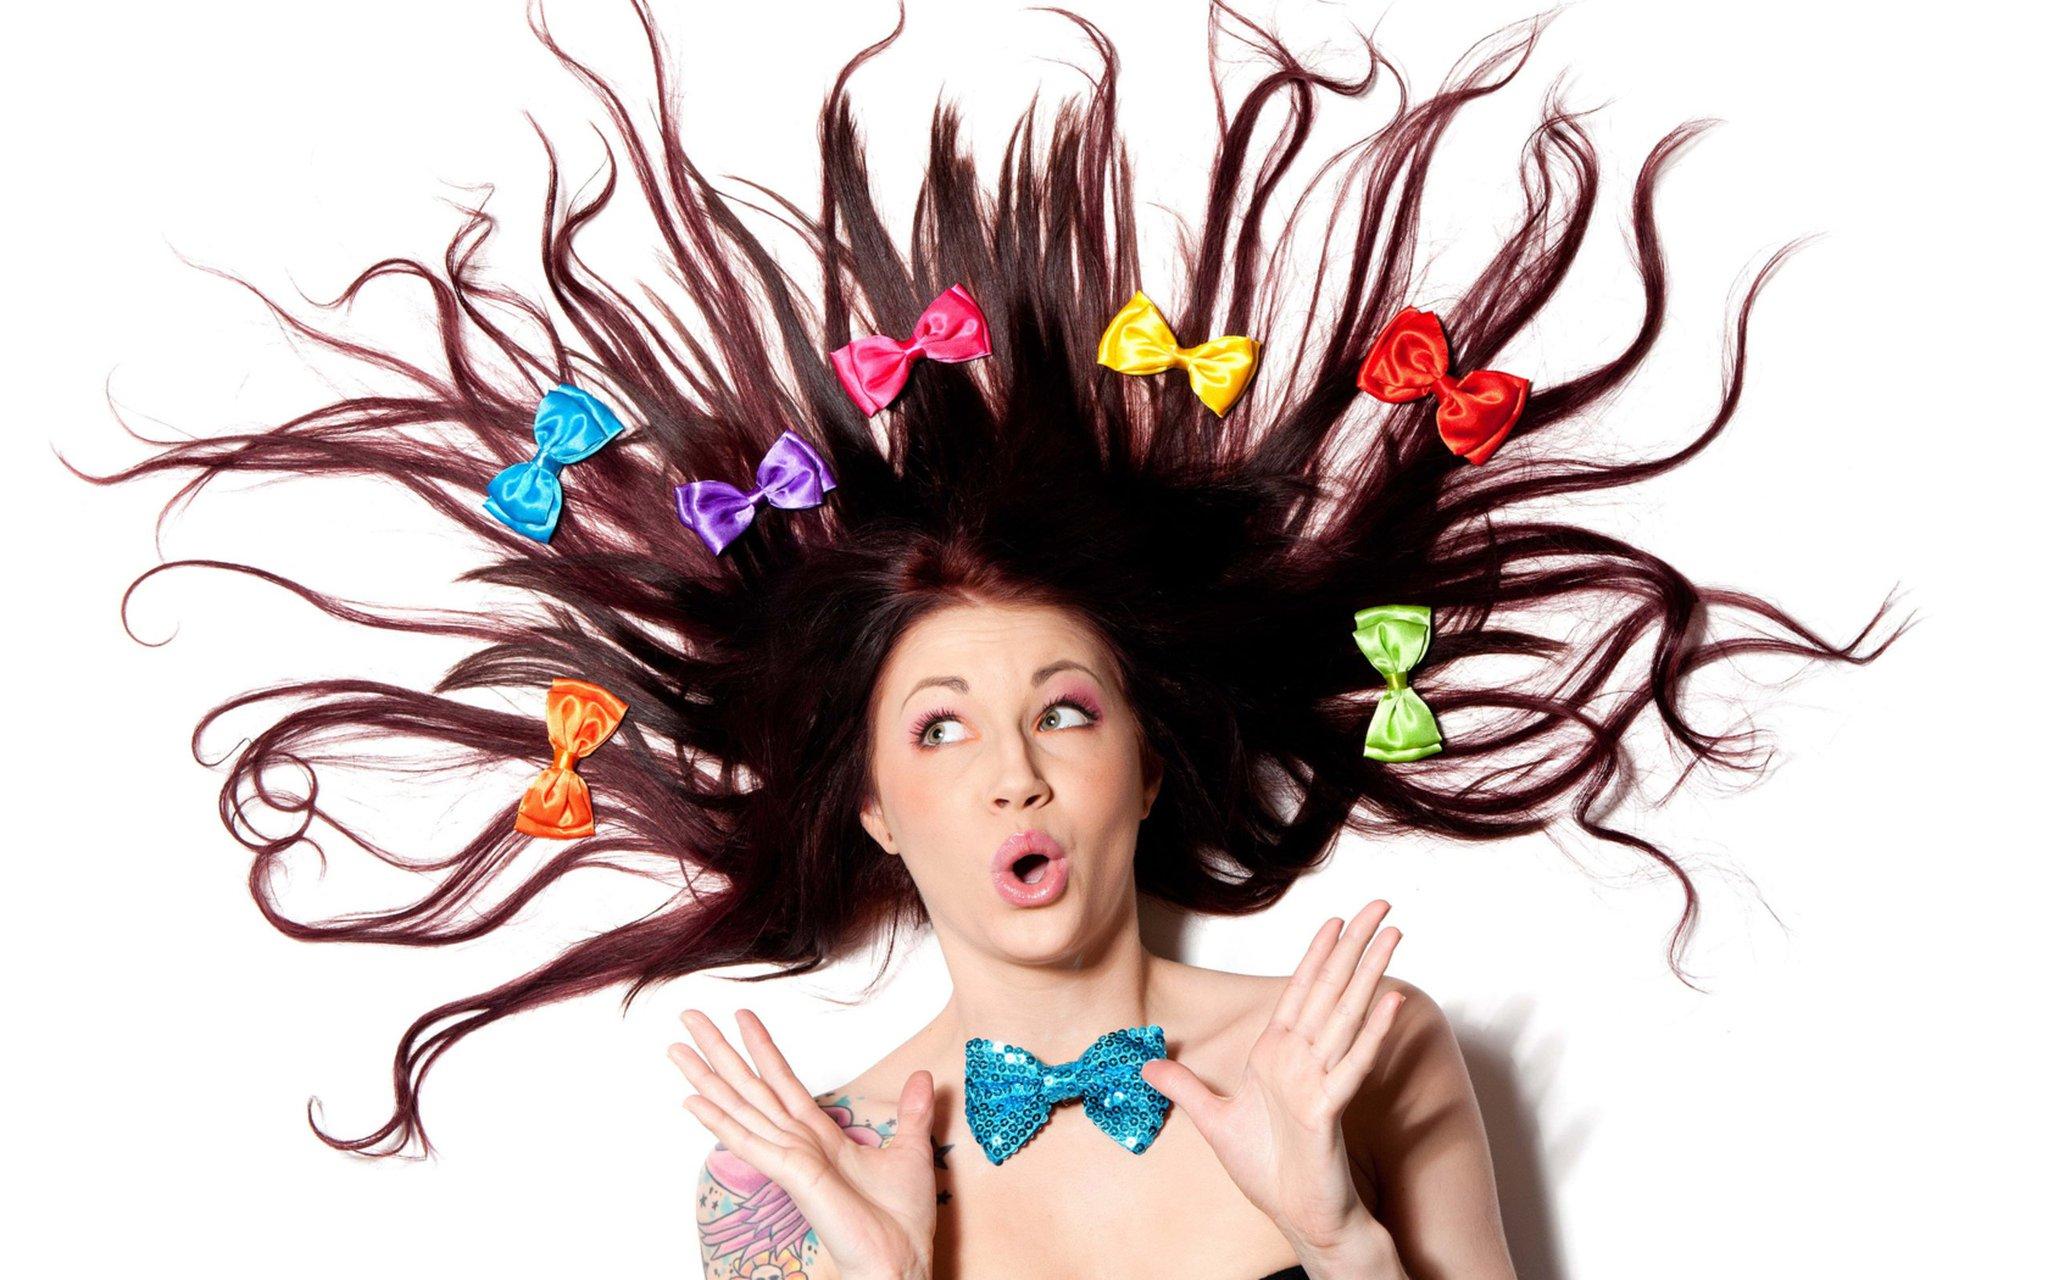 как креатив волос картинки тоже люди